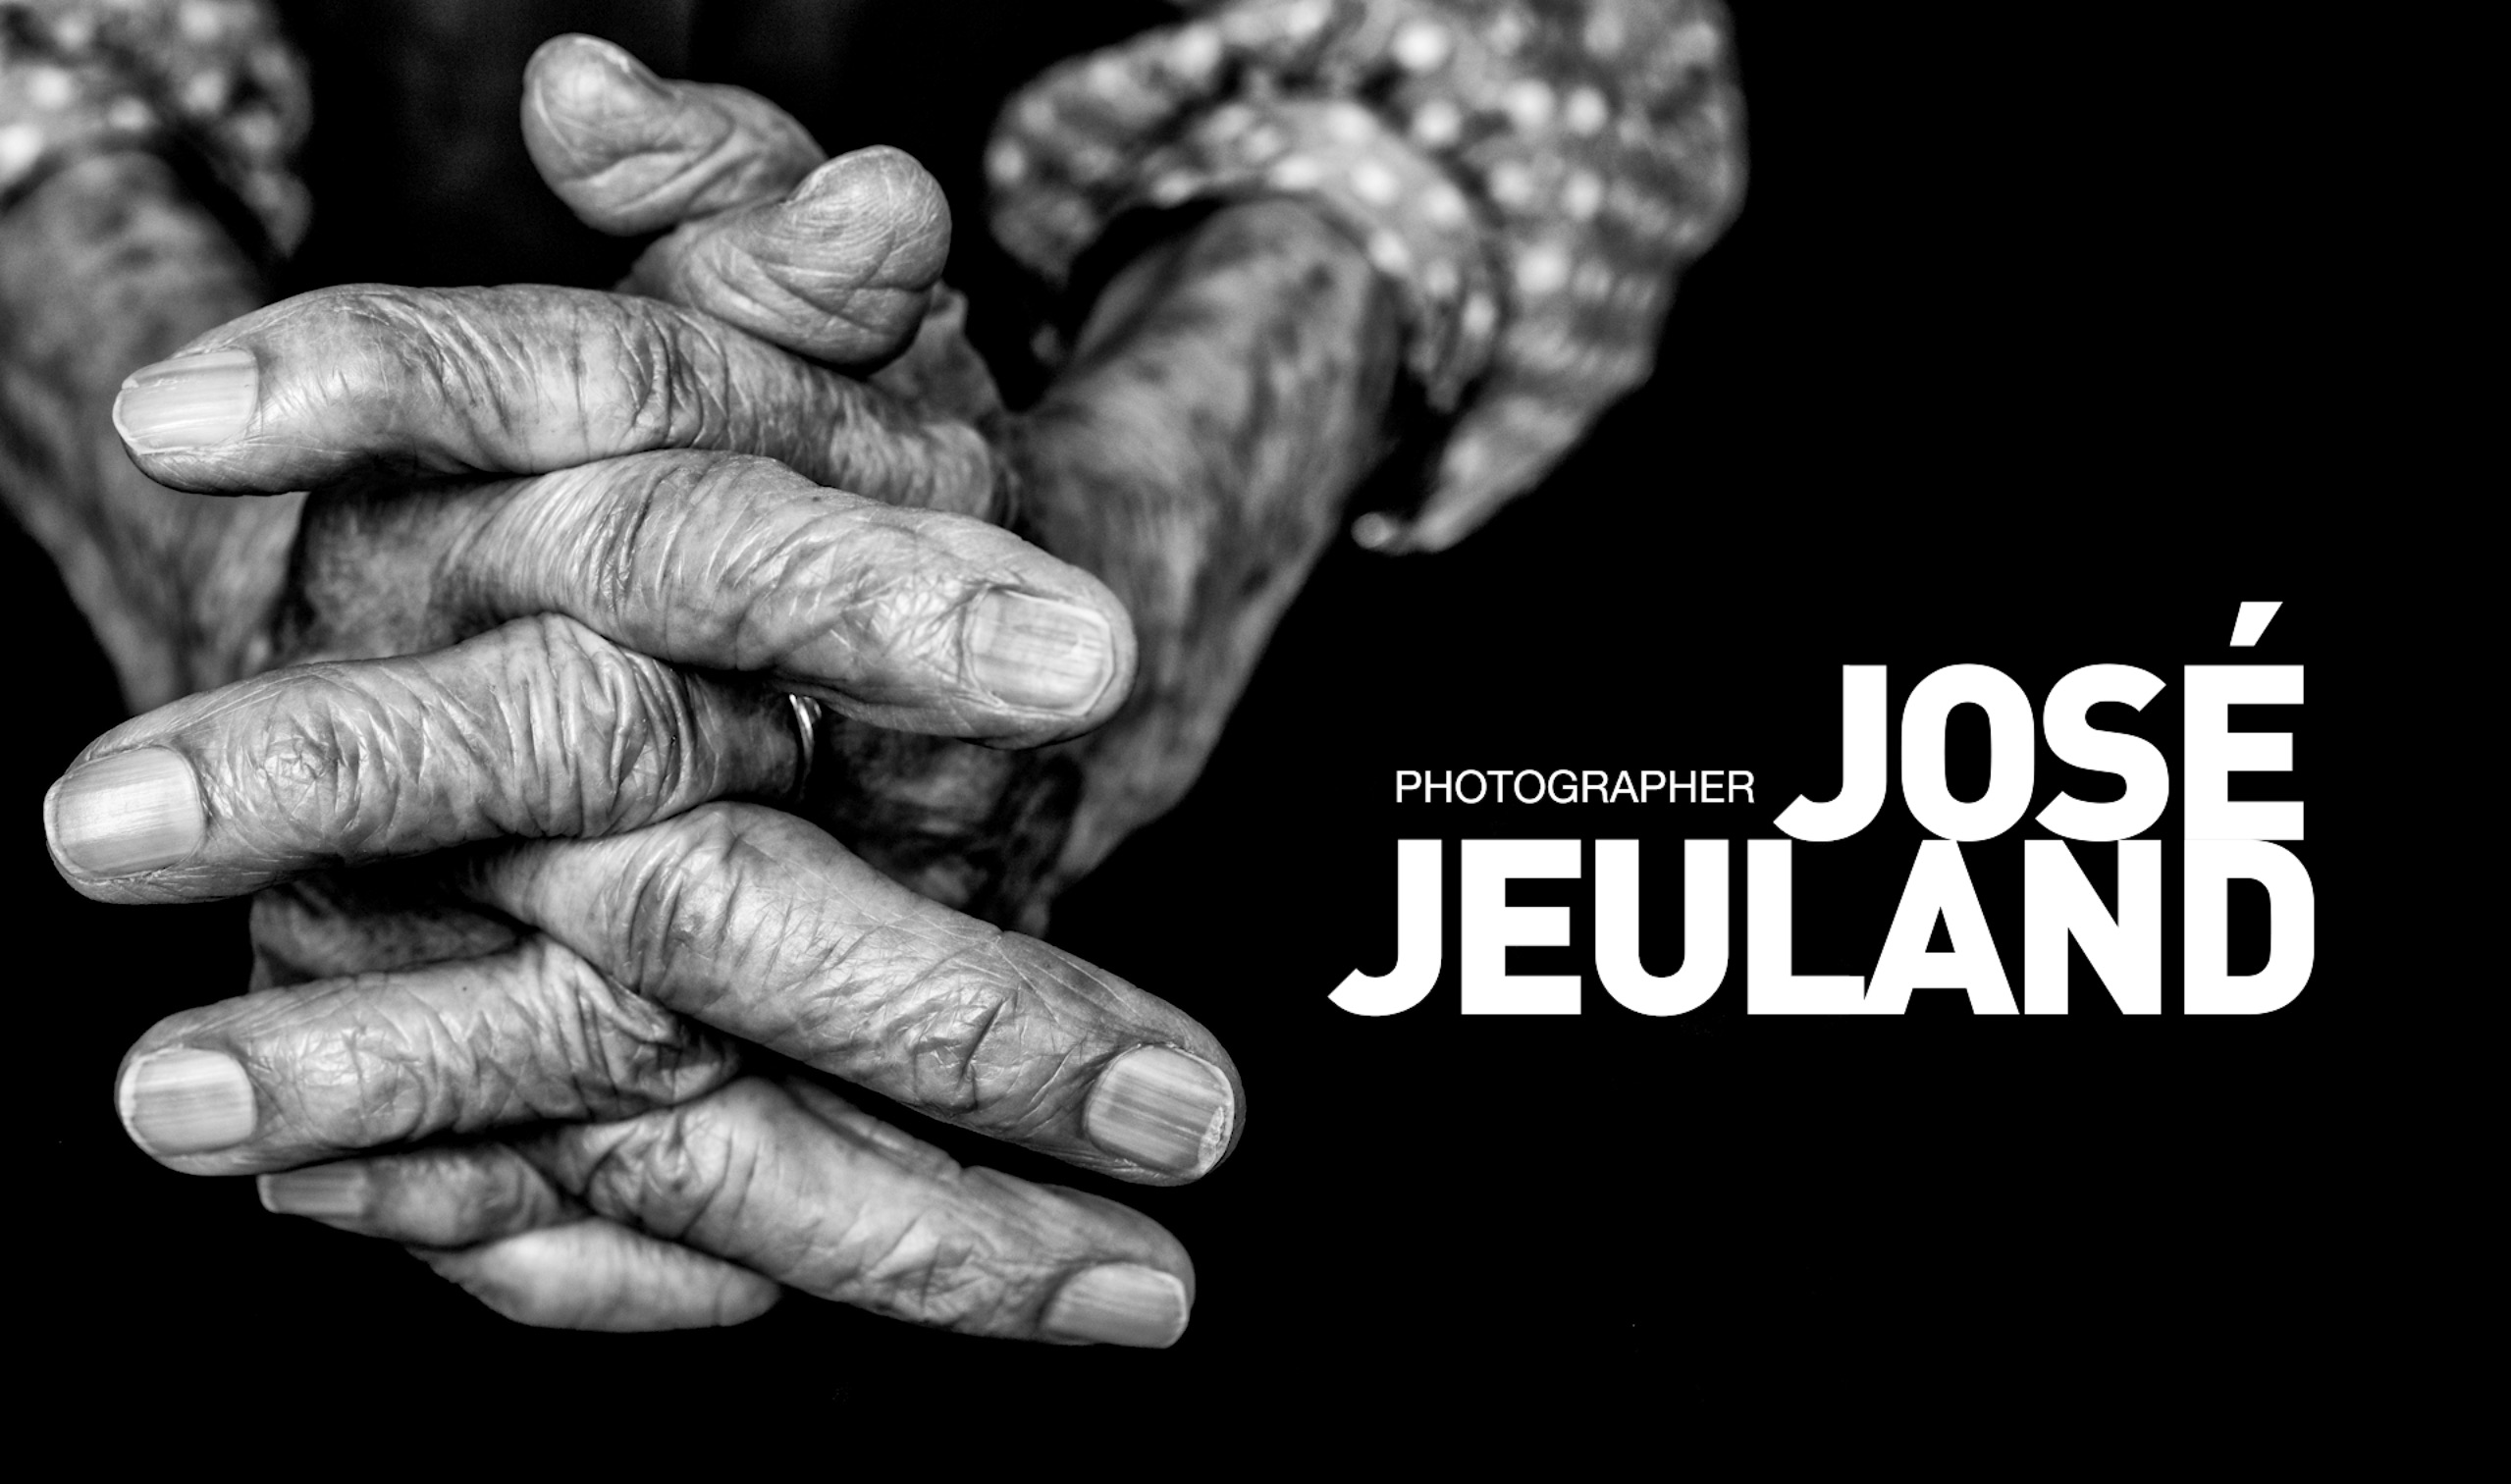 Jose Jeuland photographer - Photography portfolio